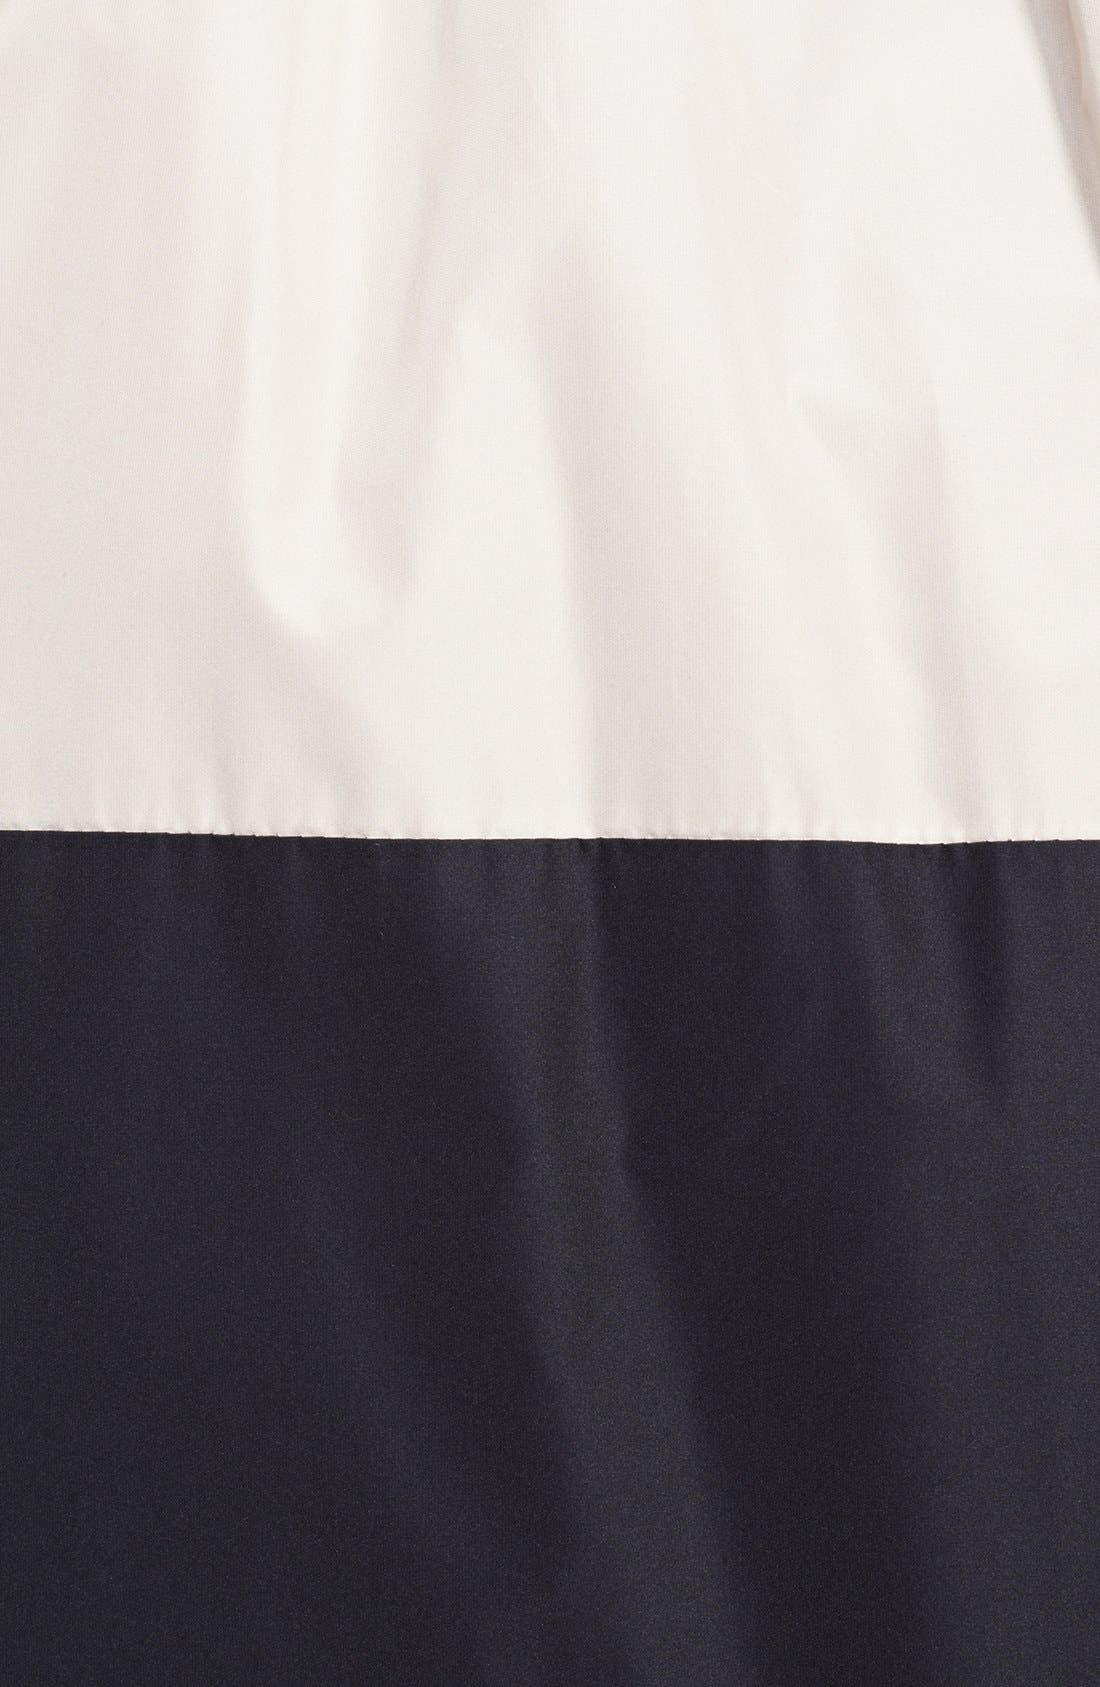 Alternate Image 3  - Max Mara 'Zemira' Belted Trench Coat